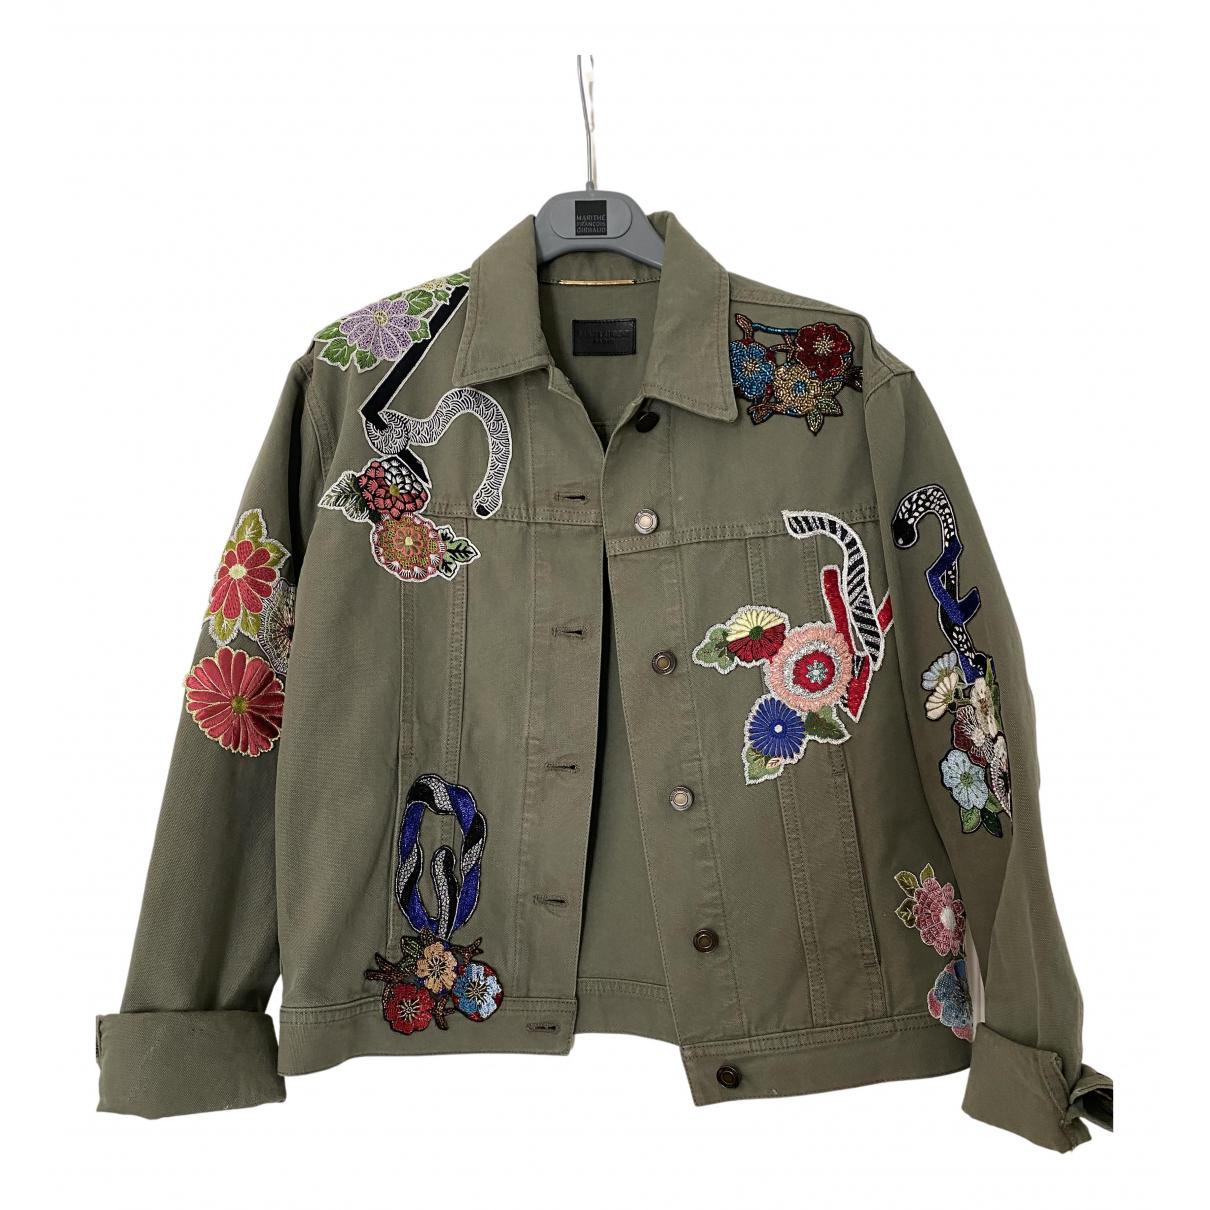 Saint Laurent N Green Cotton jacket for Women M International